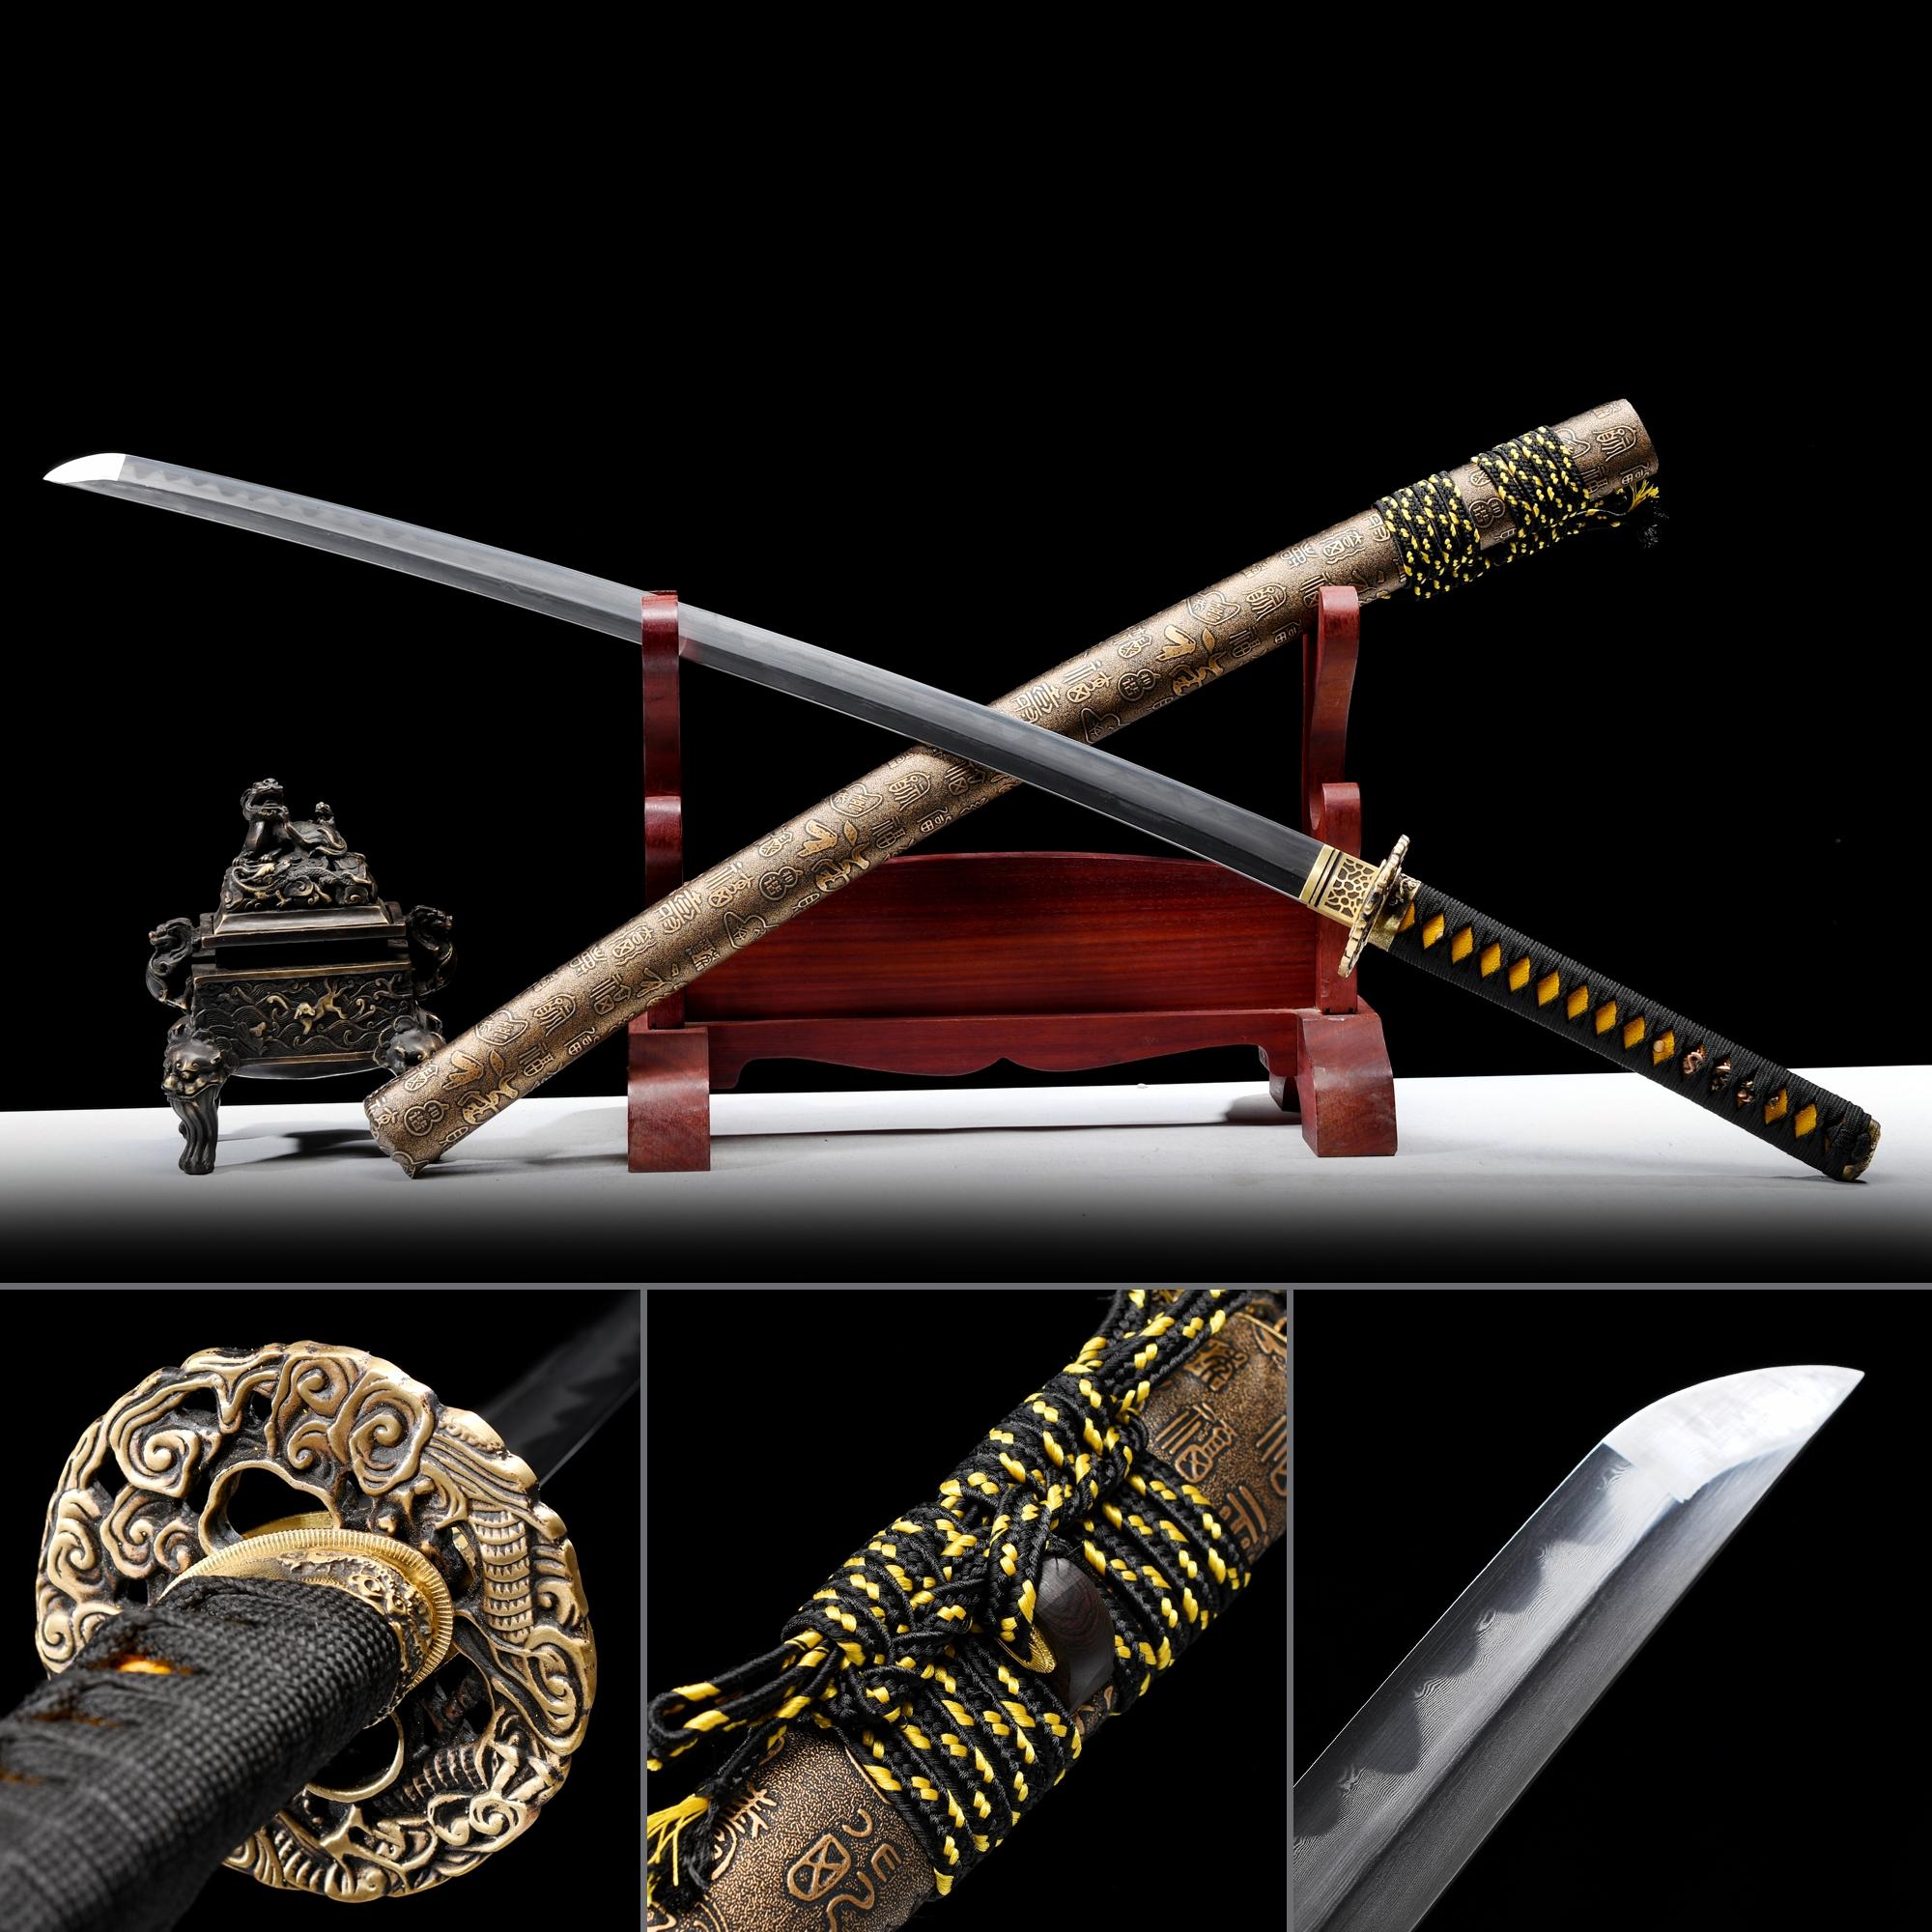 High-performance Pattern Steel Real Hamon Japanese Katana Samurai Sword With Bronze Scabbard